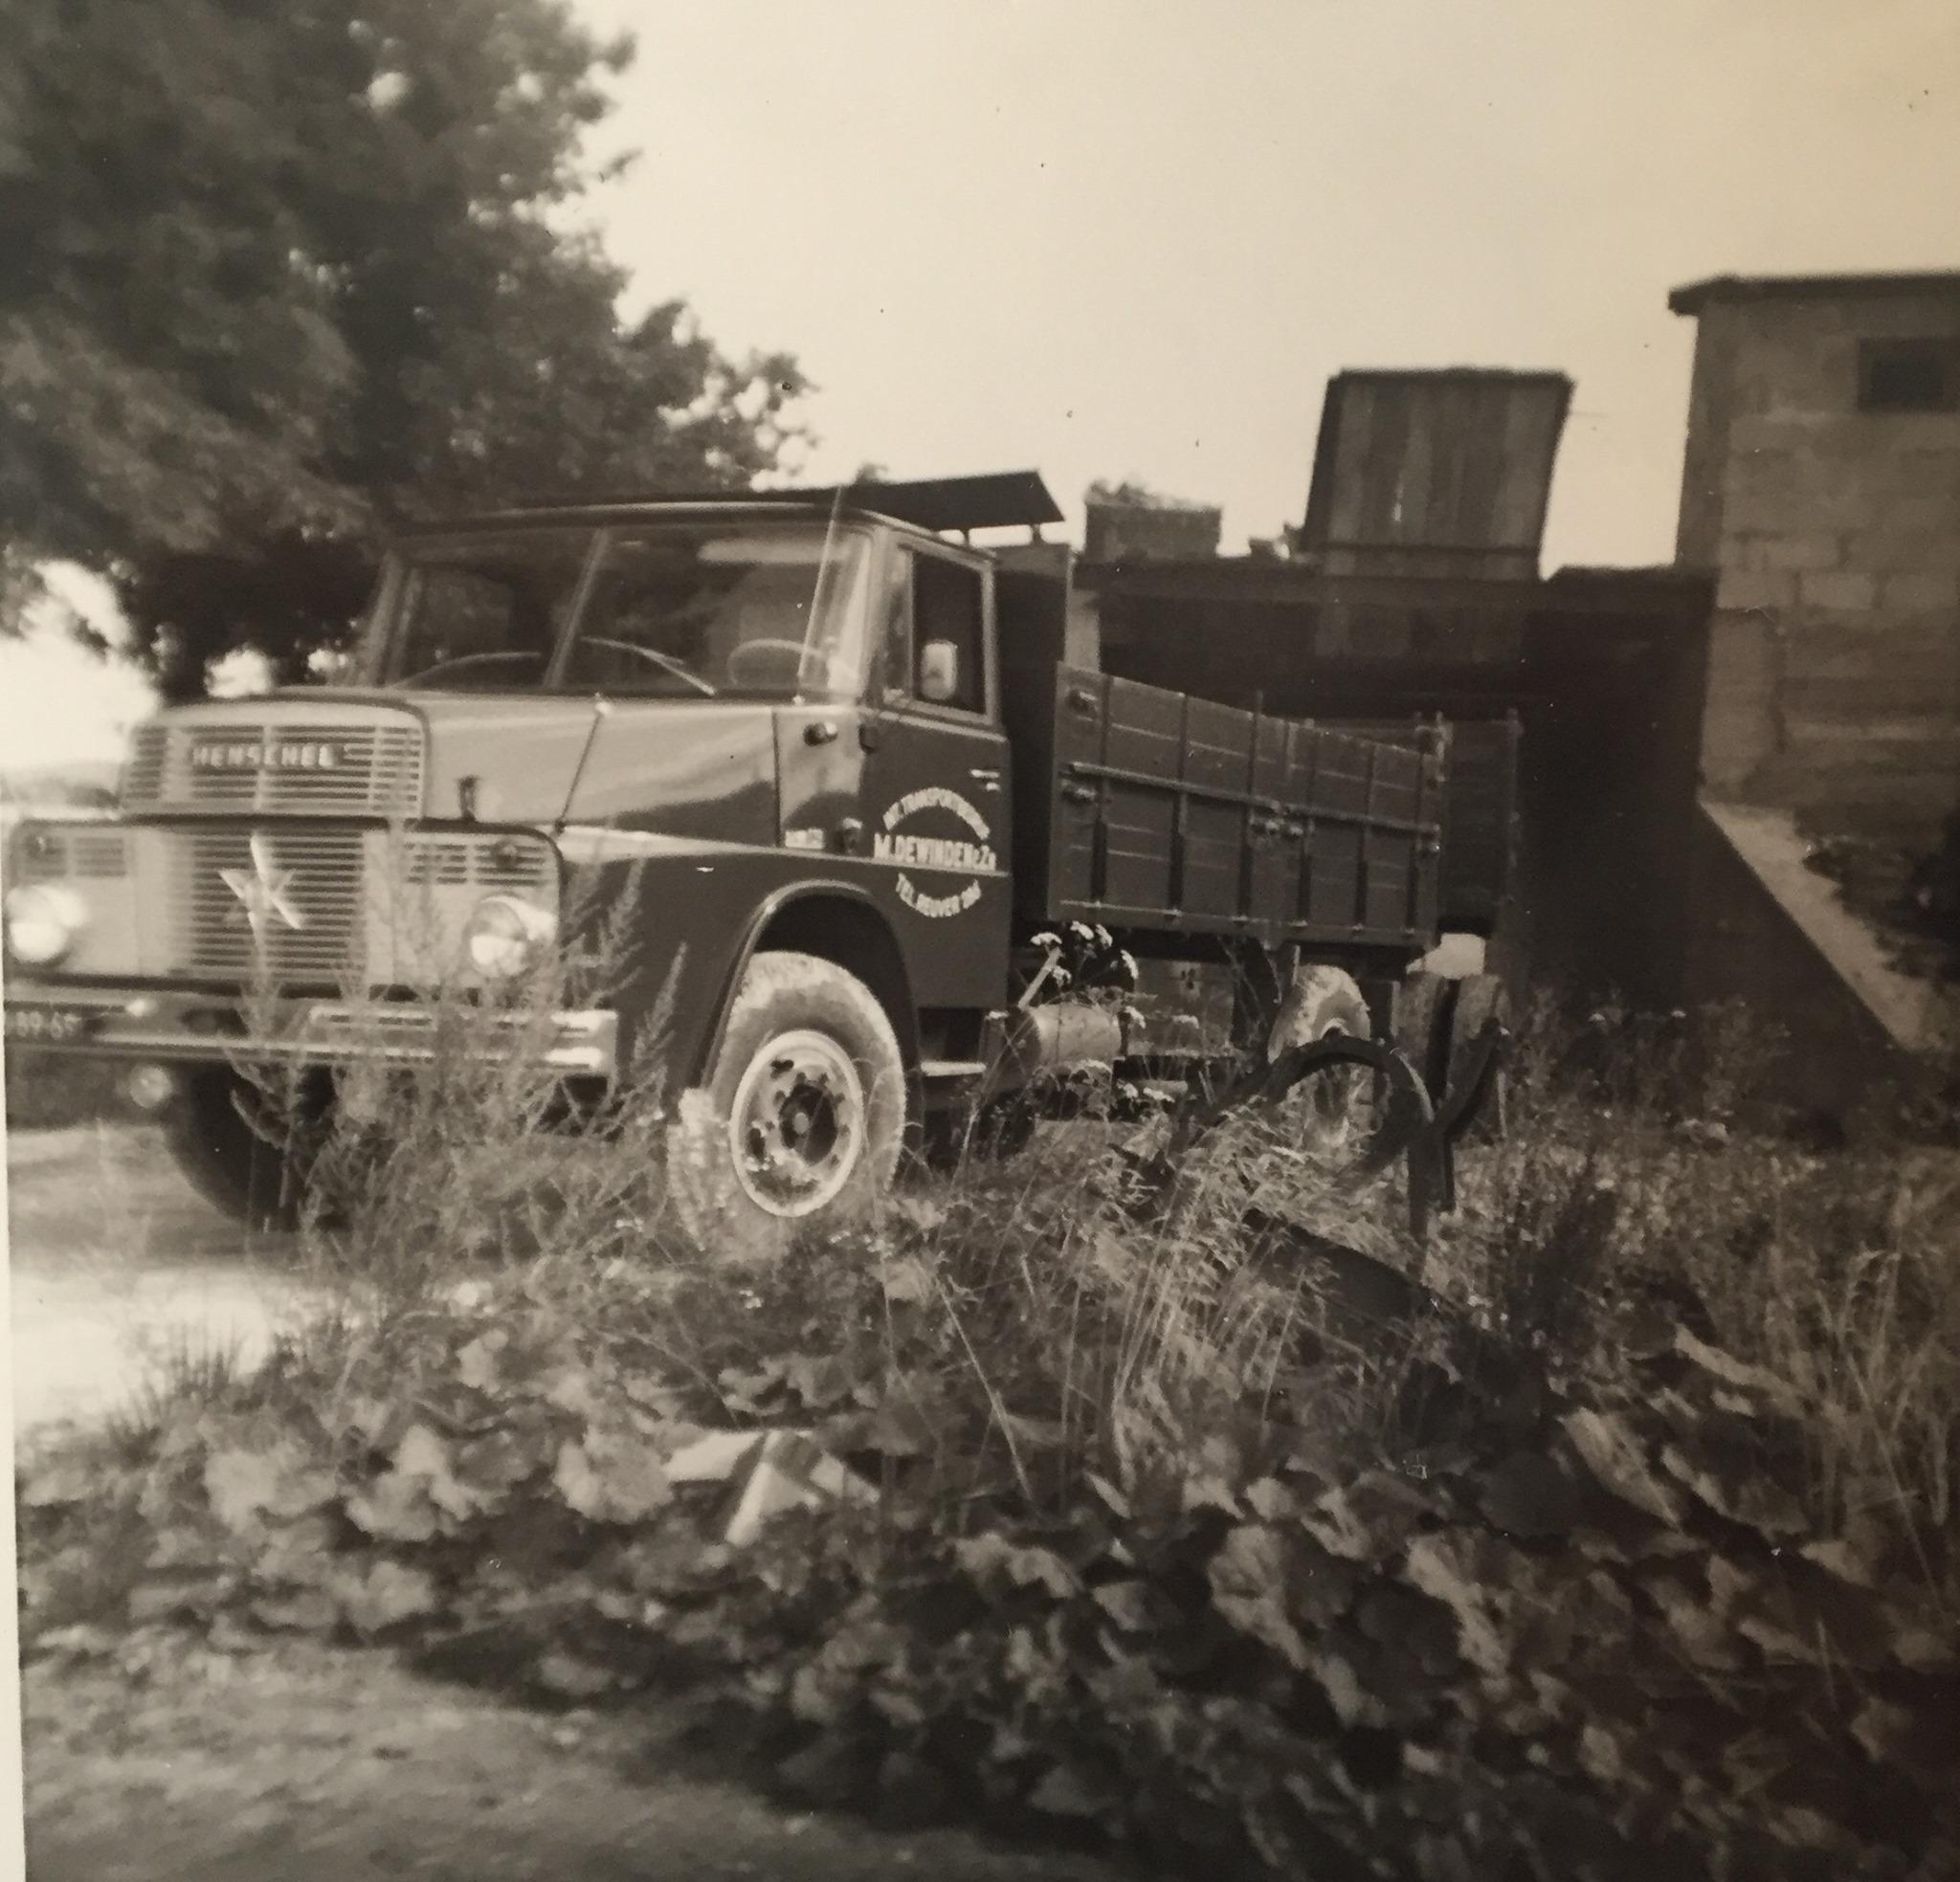 Henschel-groebe-Hassmann-in-Leuterrod-WW-VB-89-69-Jeu-1963-